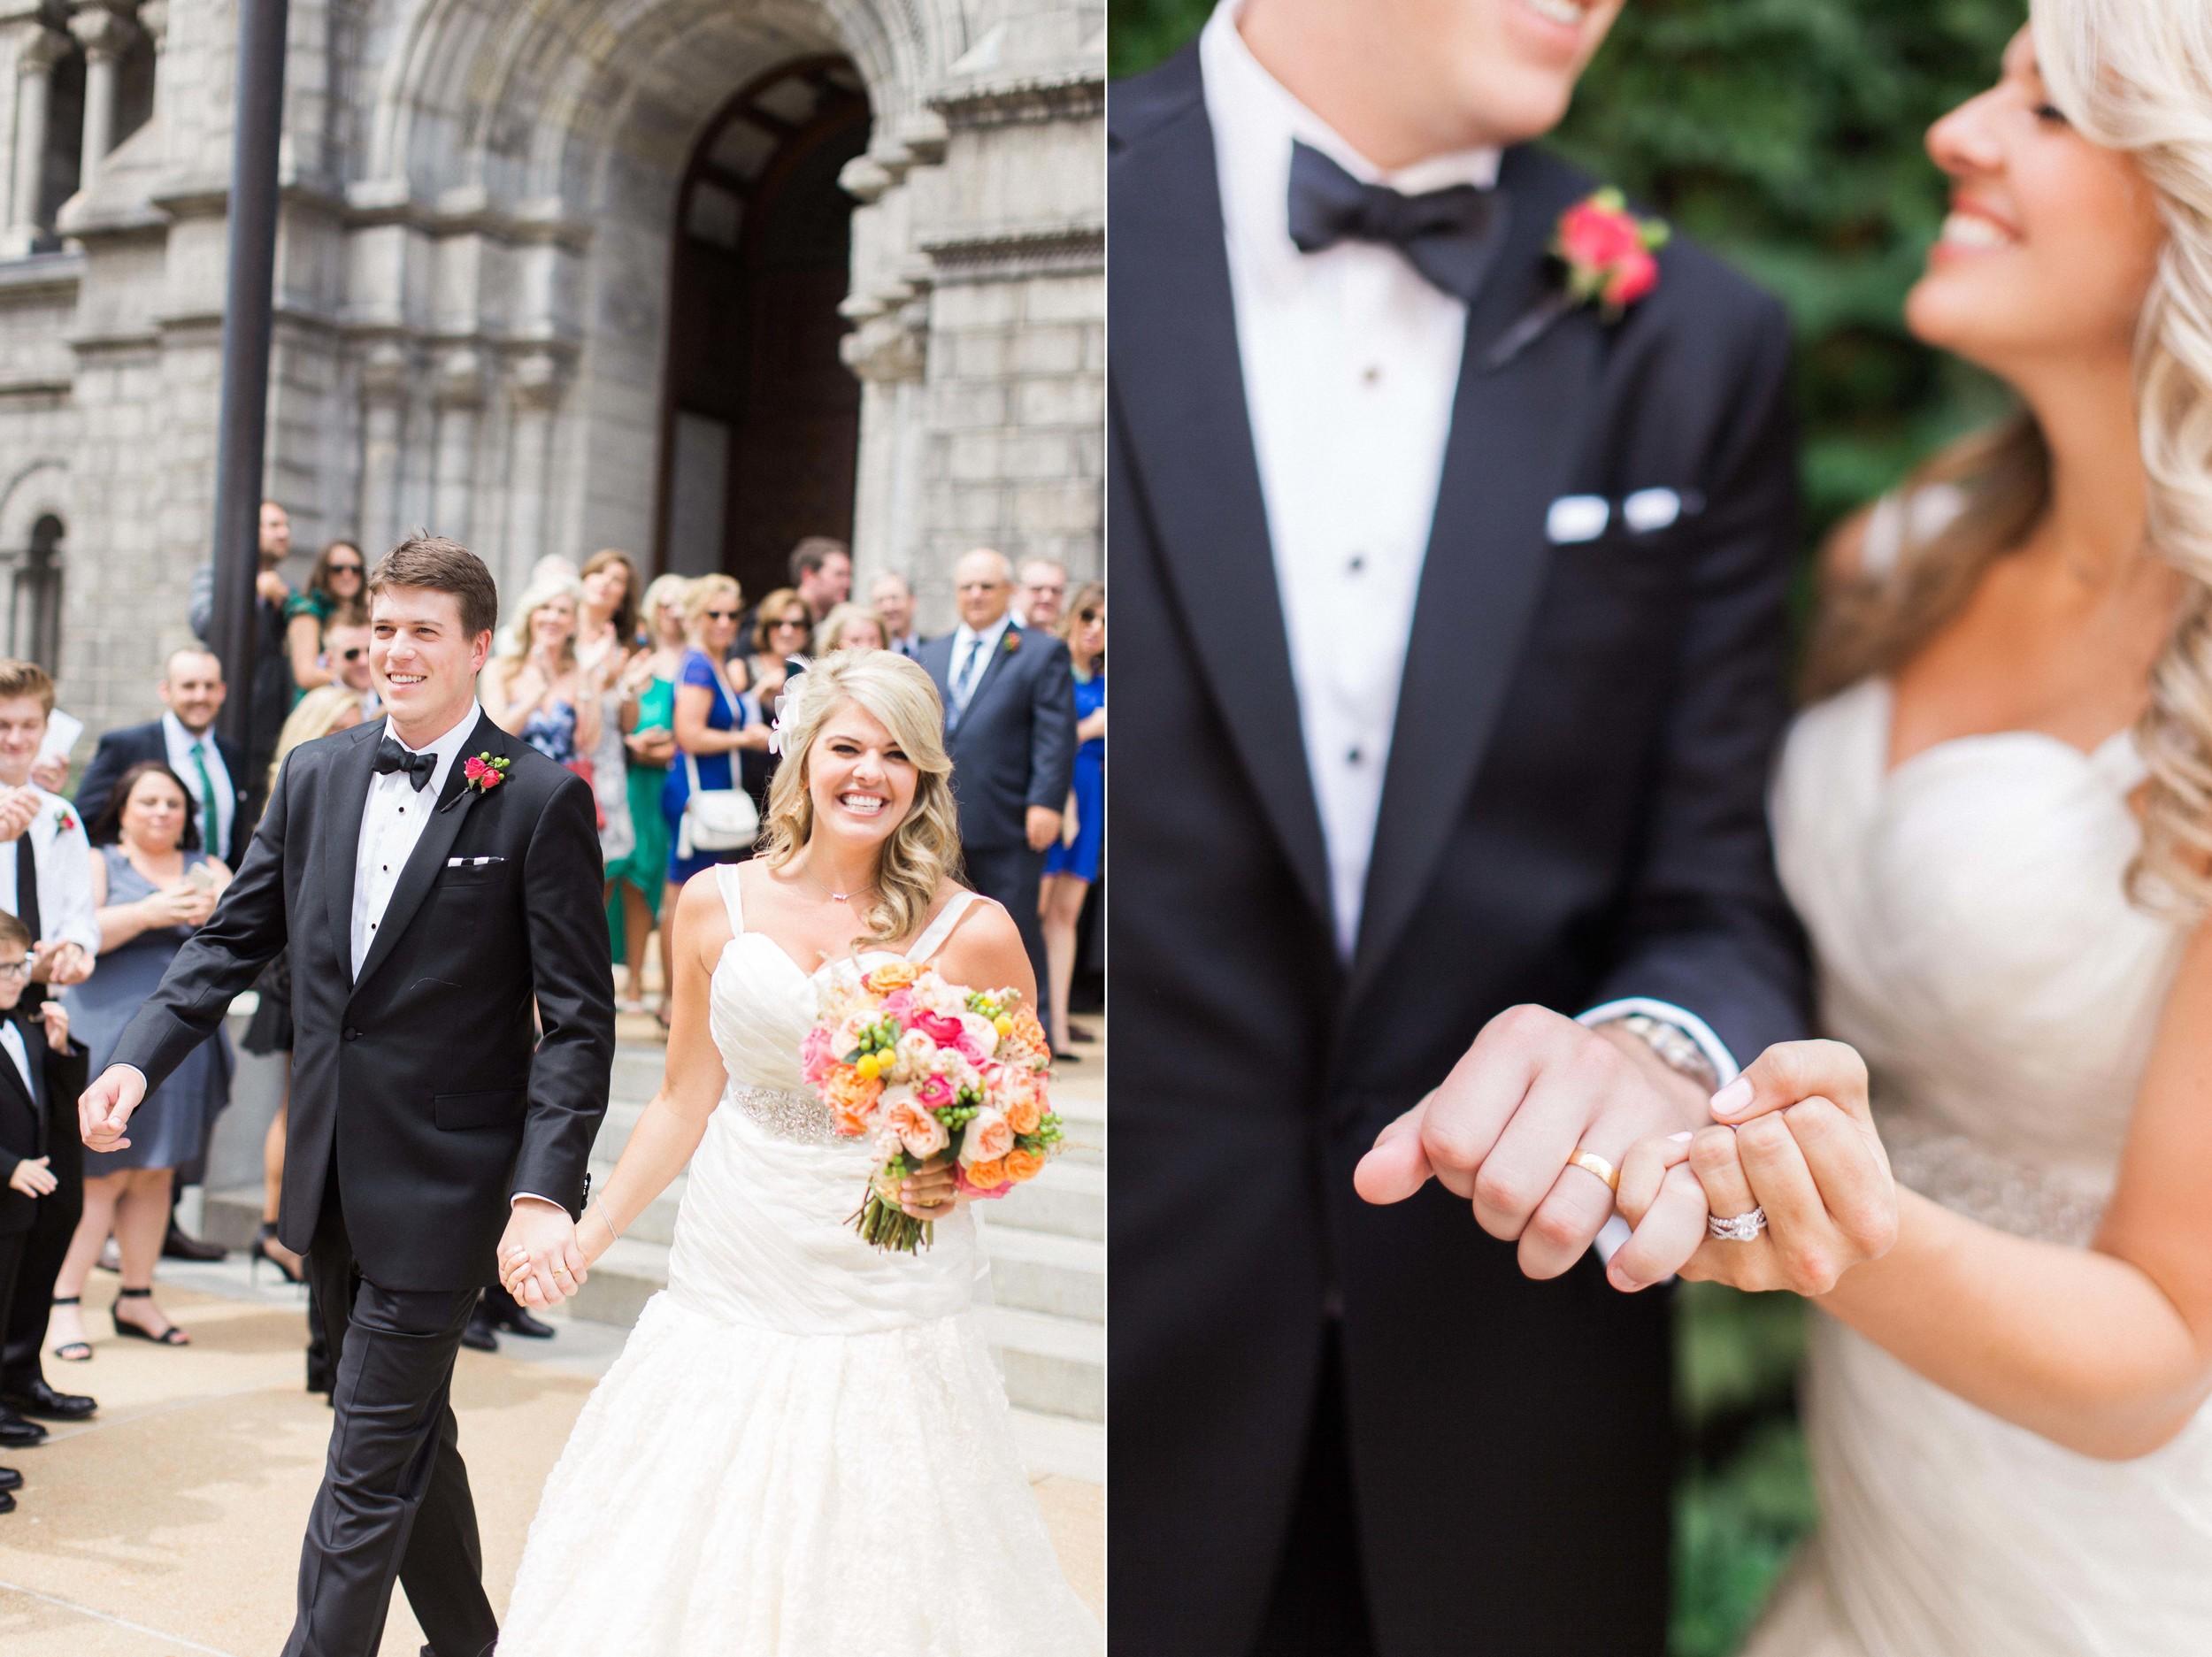 Chase Park Plaza St Louis Wedding Photo-1042 copy.jpg